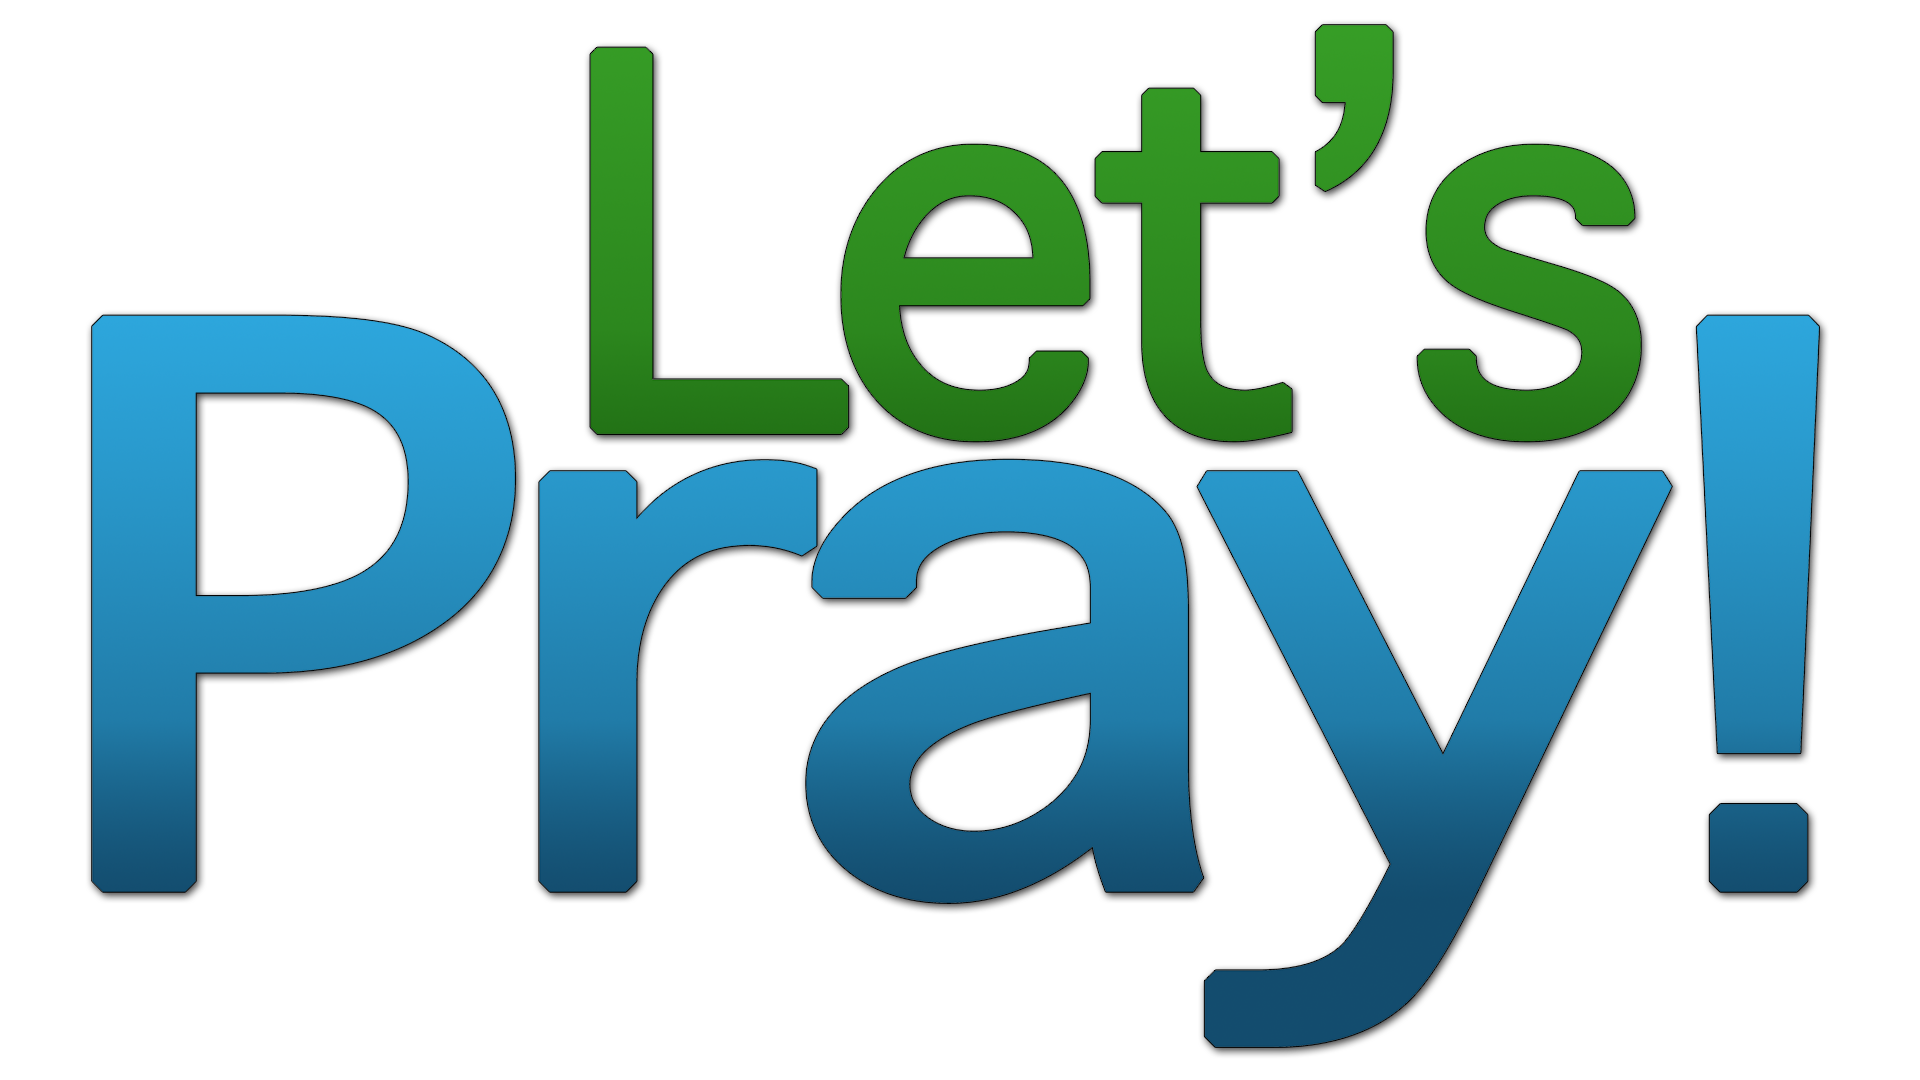 Intercessory Prayer Clipart | Free download best Intercessory Prayer